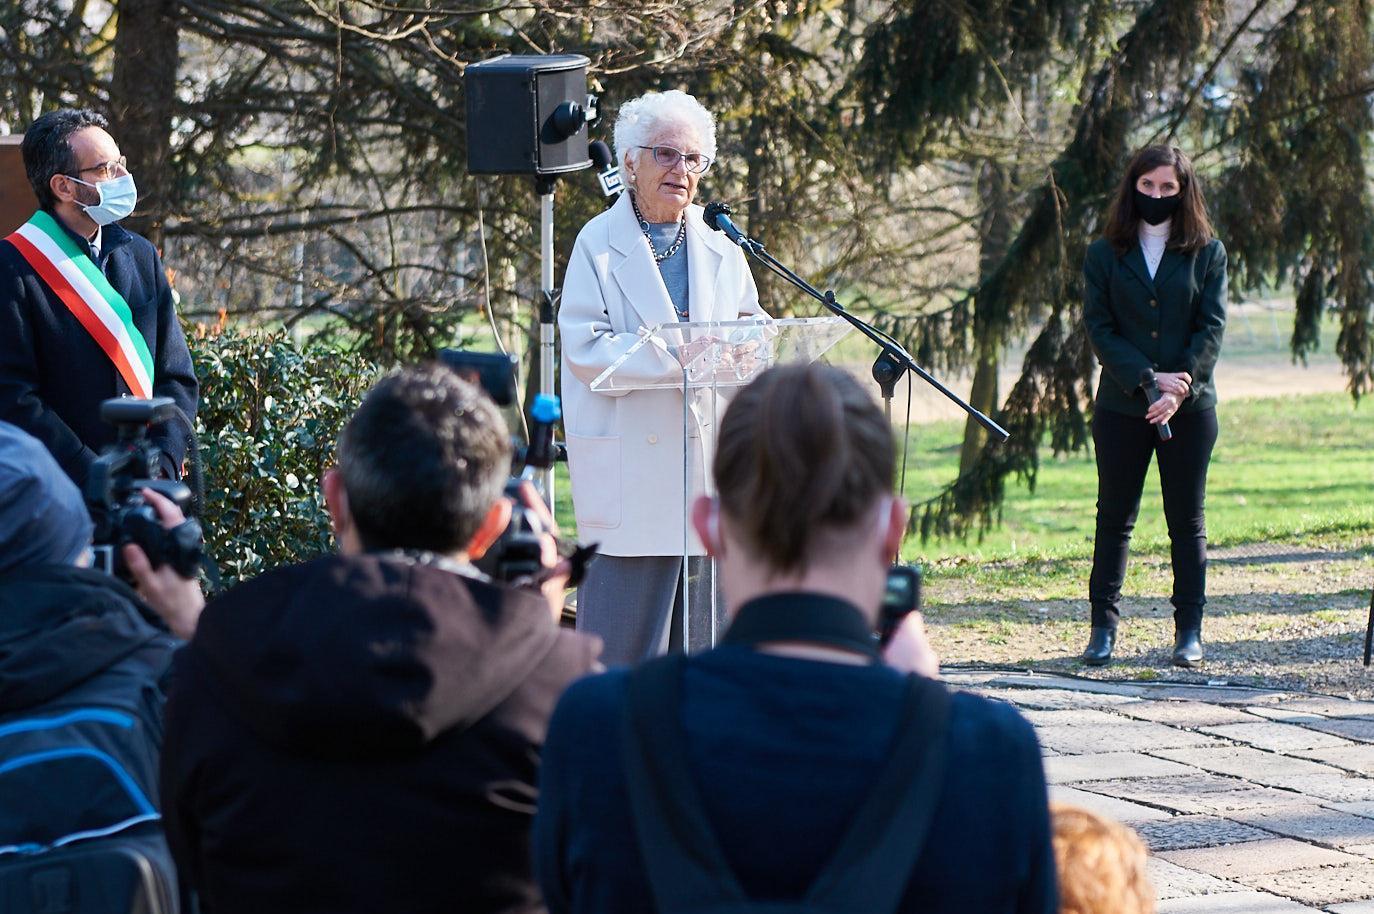 La Senatrice Liliana Segre ricorda la Giusta Susanna Aimo